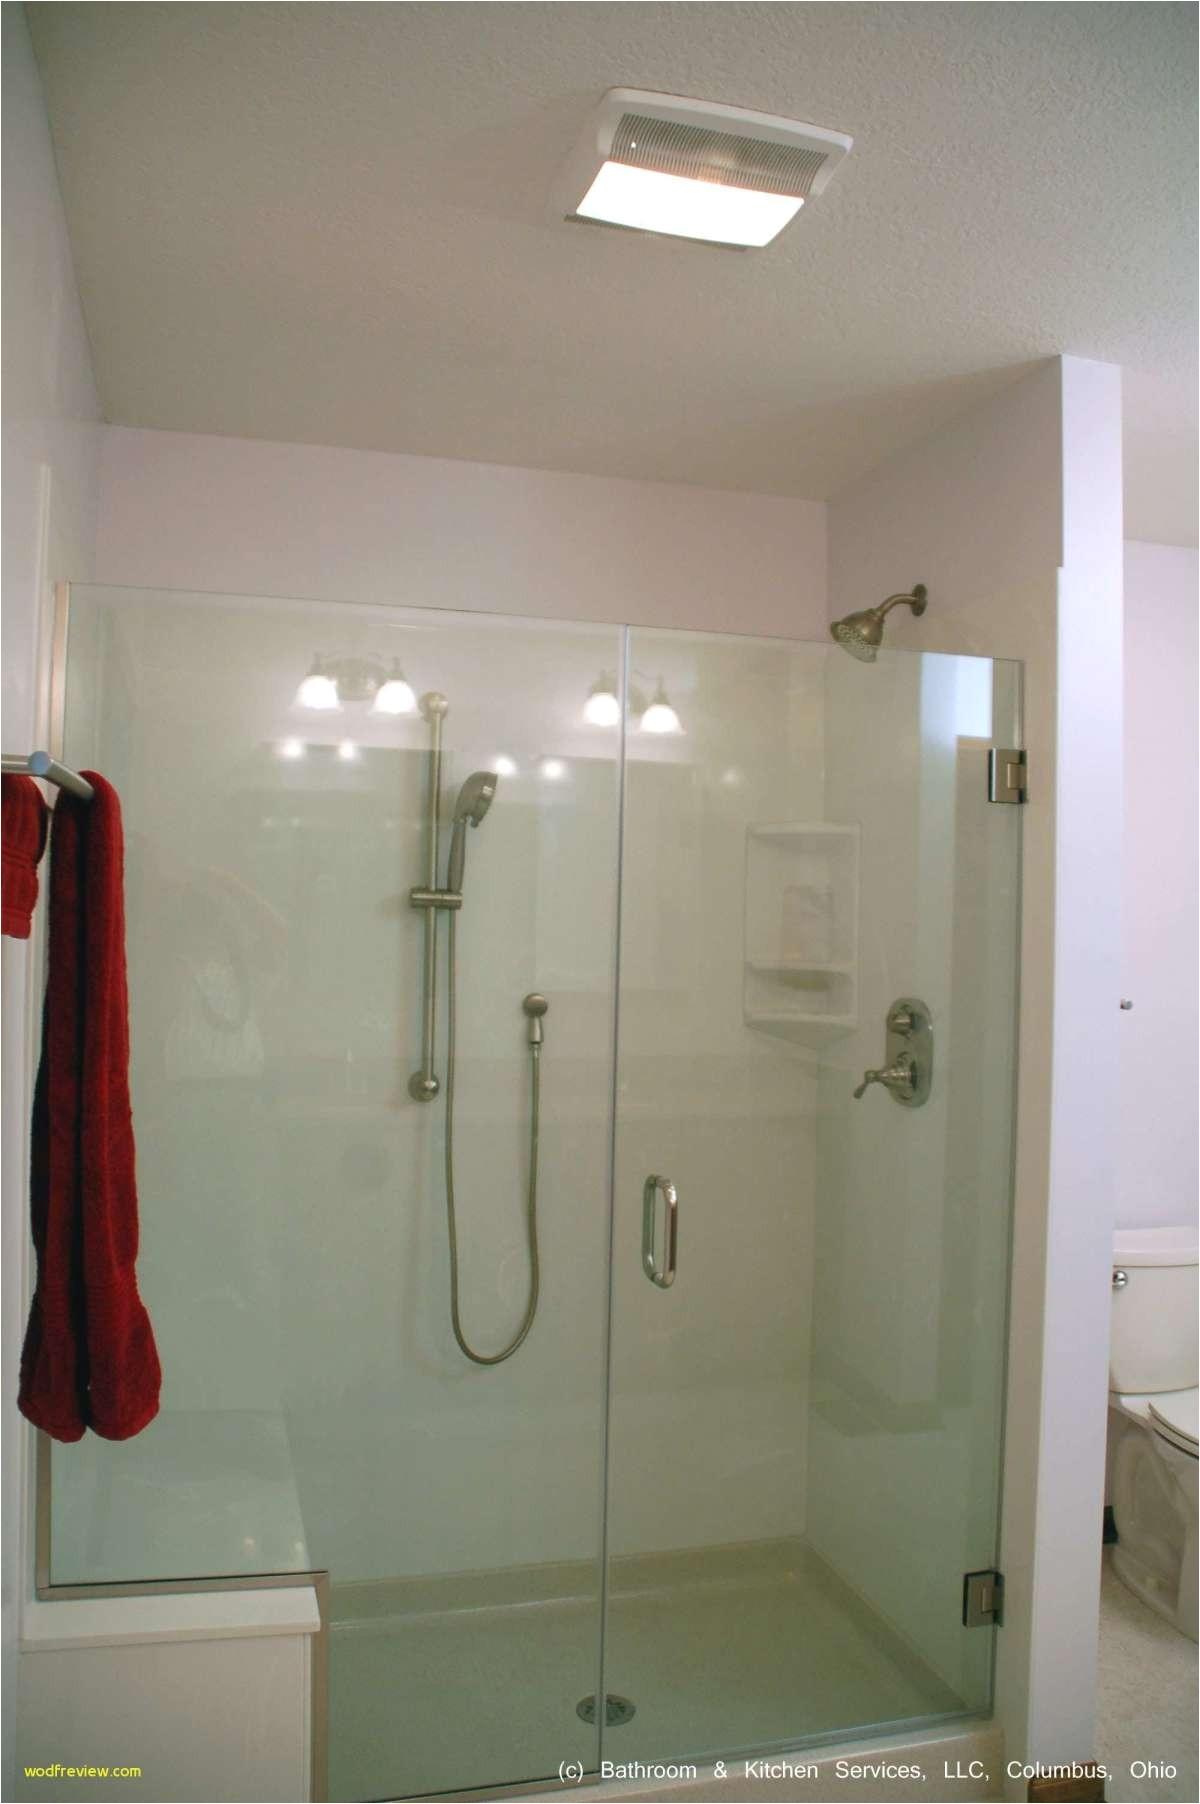 Design Ideas for Bathroom Shower Amazing Bathroom Shower Designs Beautiful Light New H Sink Install I